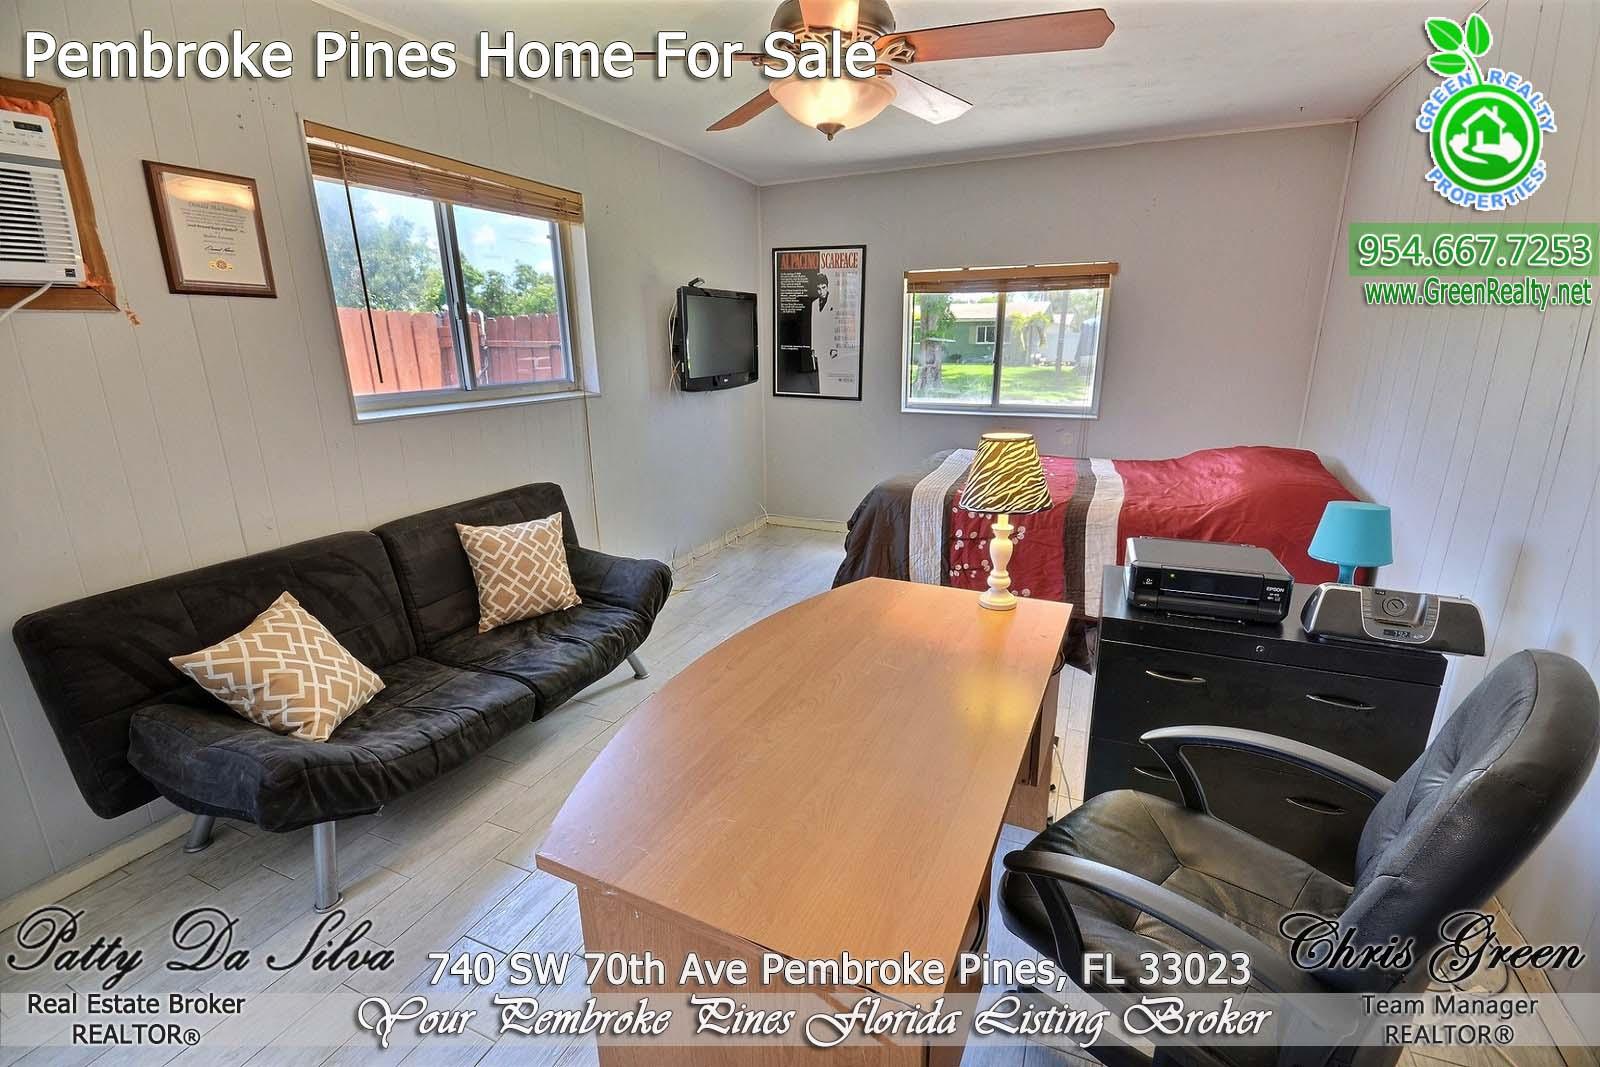 21 Pembroke Pines Real Estate Agents (3)